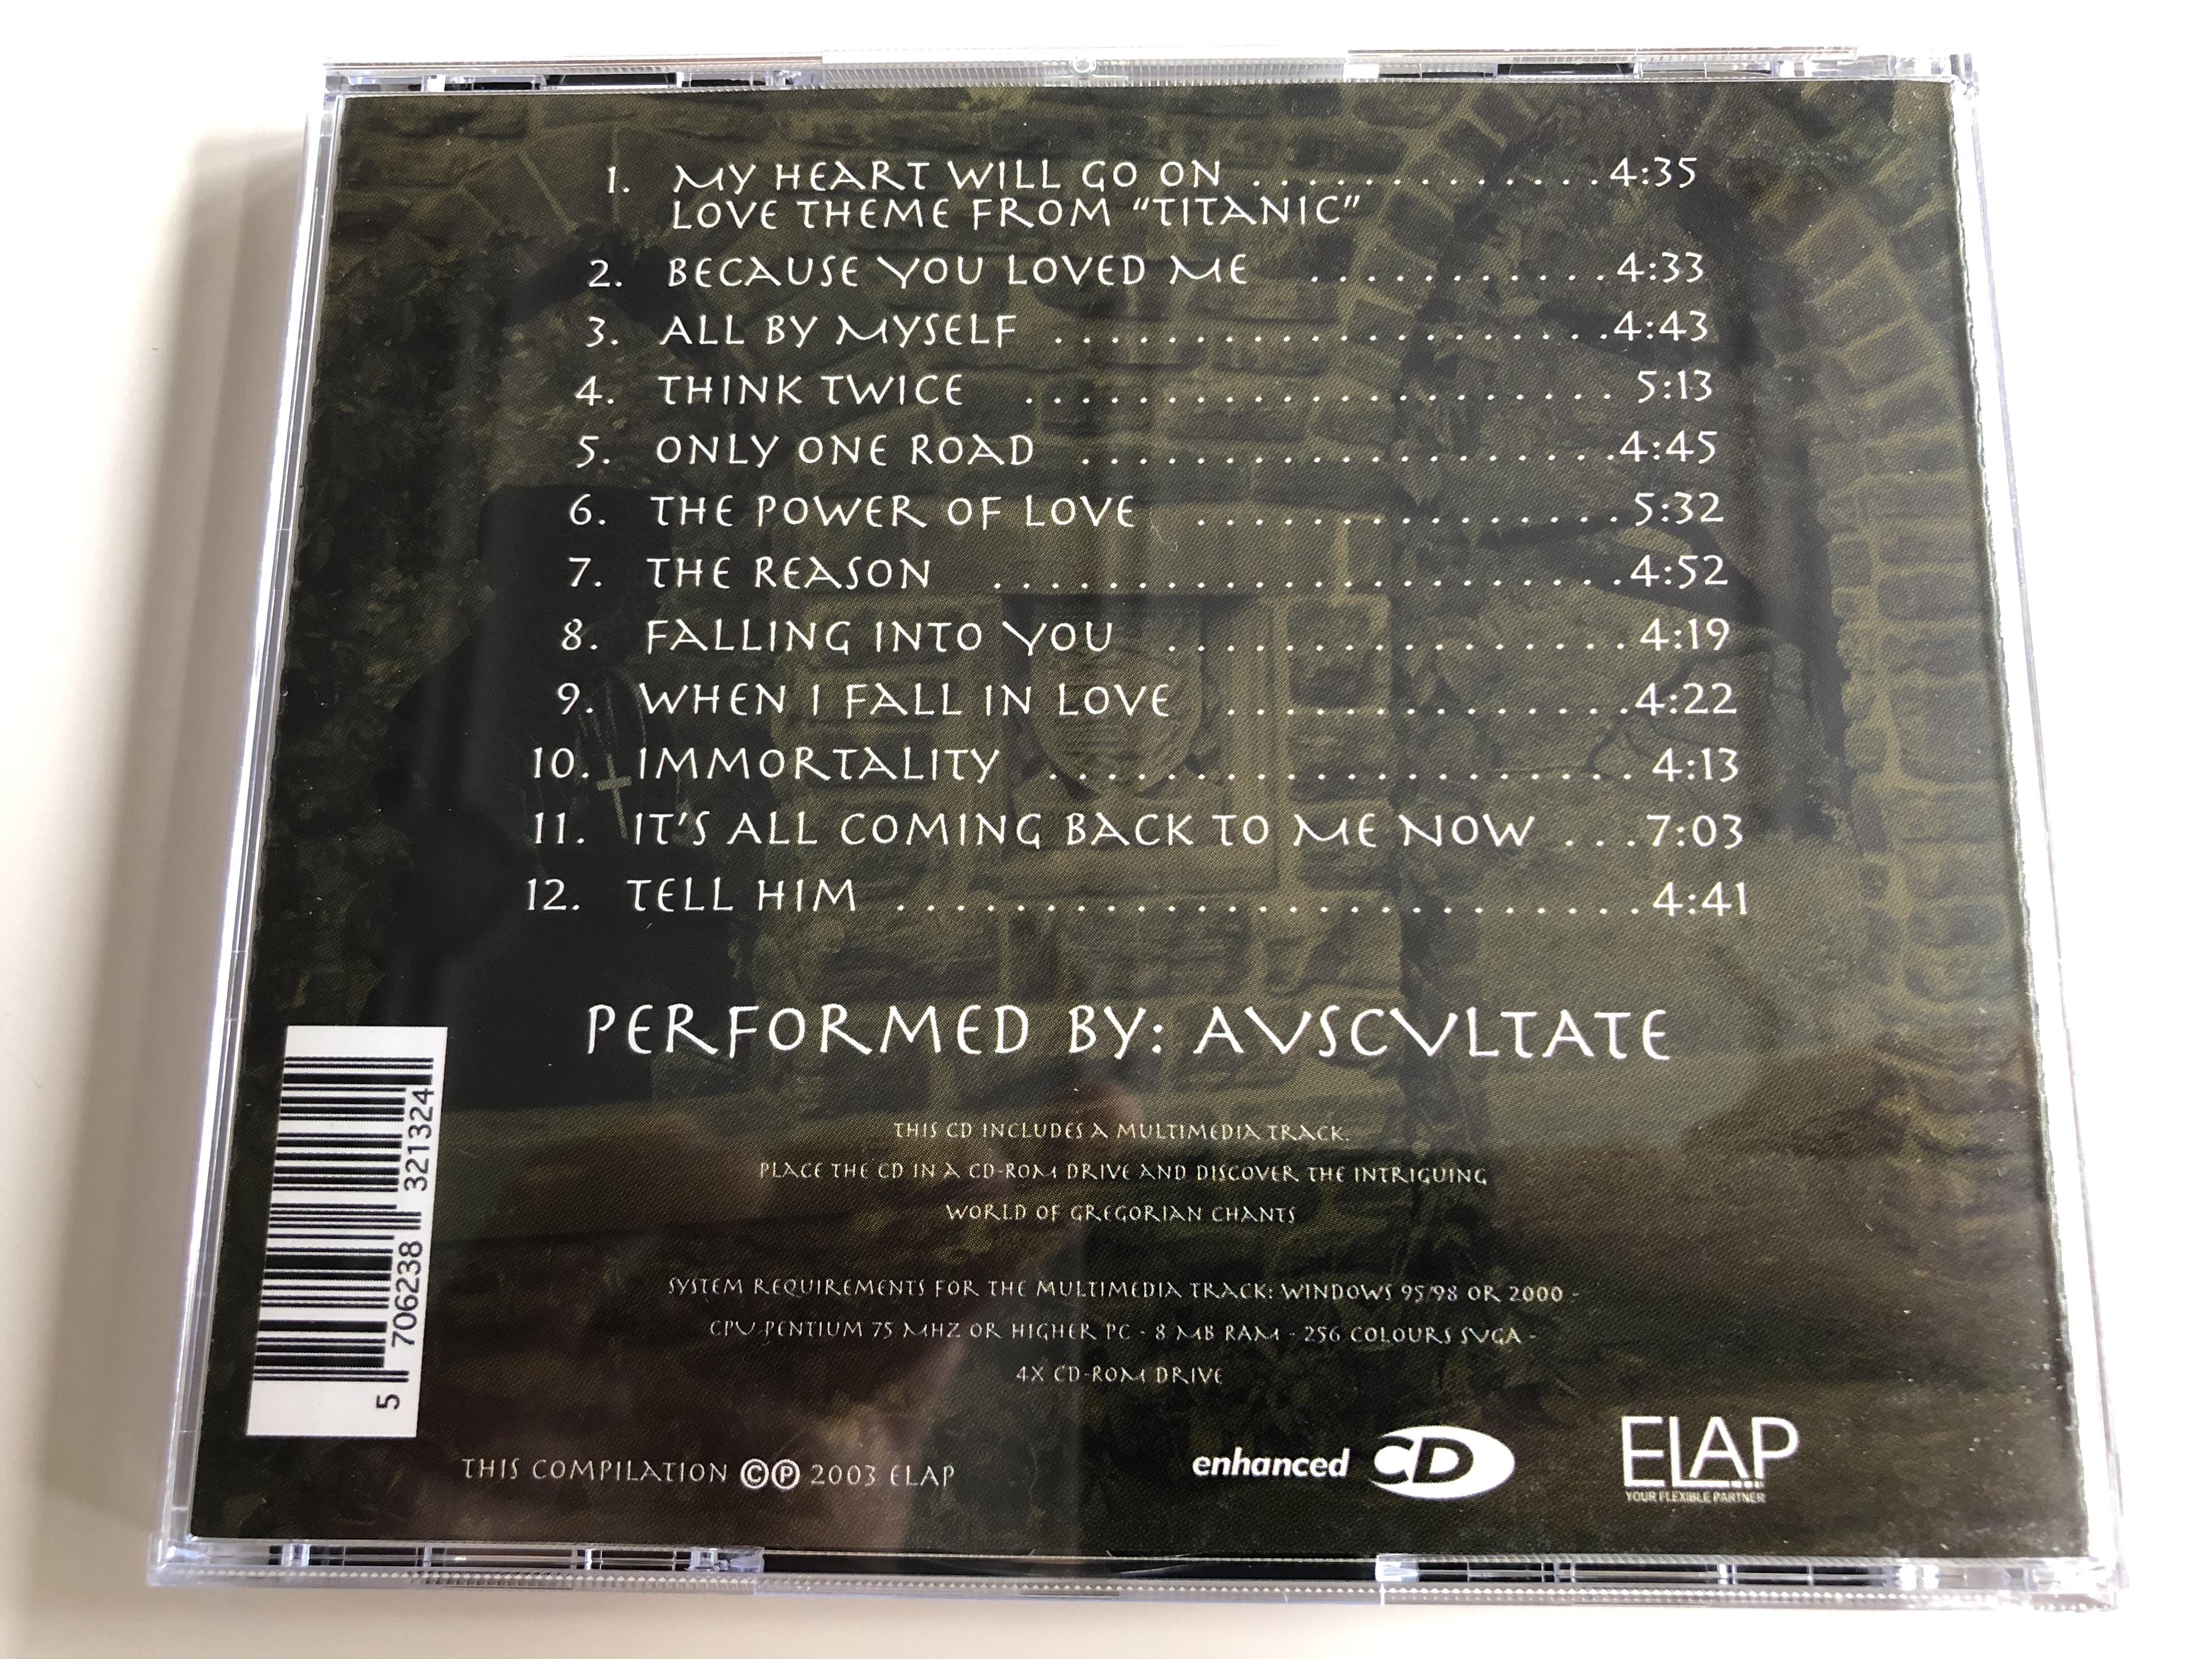 gregorian-chants-the-songs-of-celine-dion-performed-by-avscvltate-elap-music-audio-cd-2003-50020102-5-.jpg